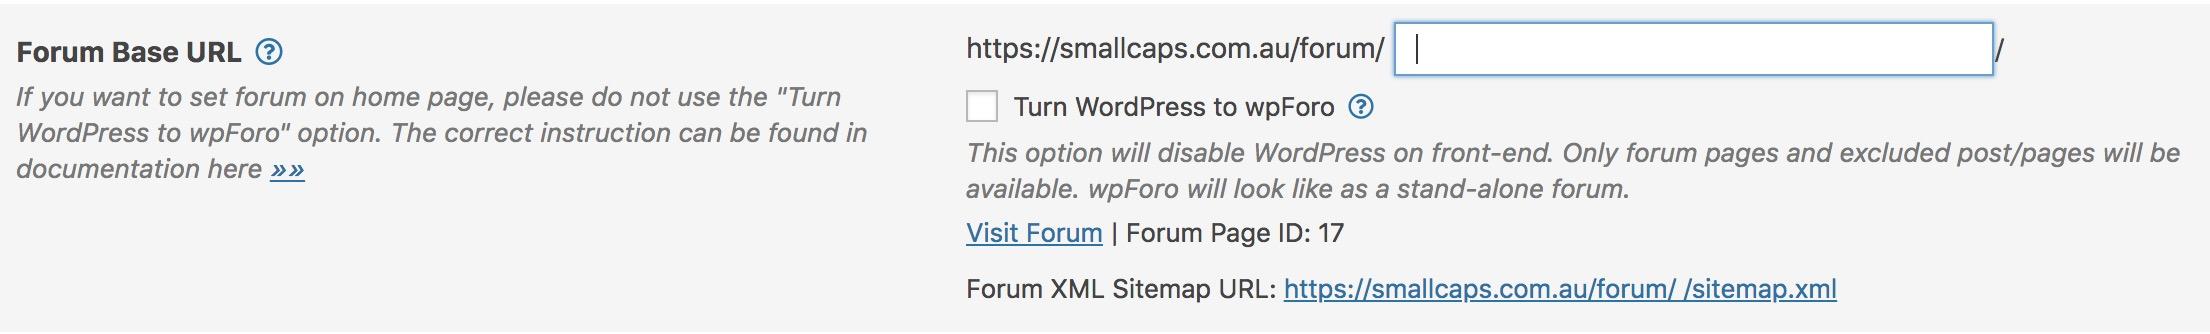 Turn WordPress to wpForo subdomain issue – How-to and